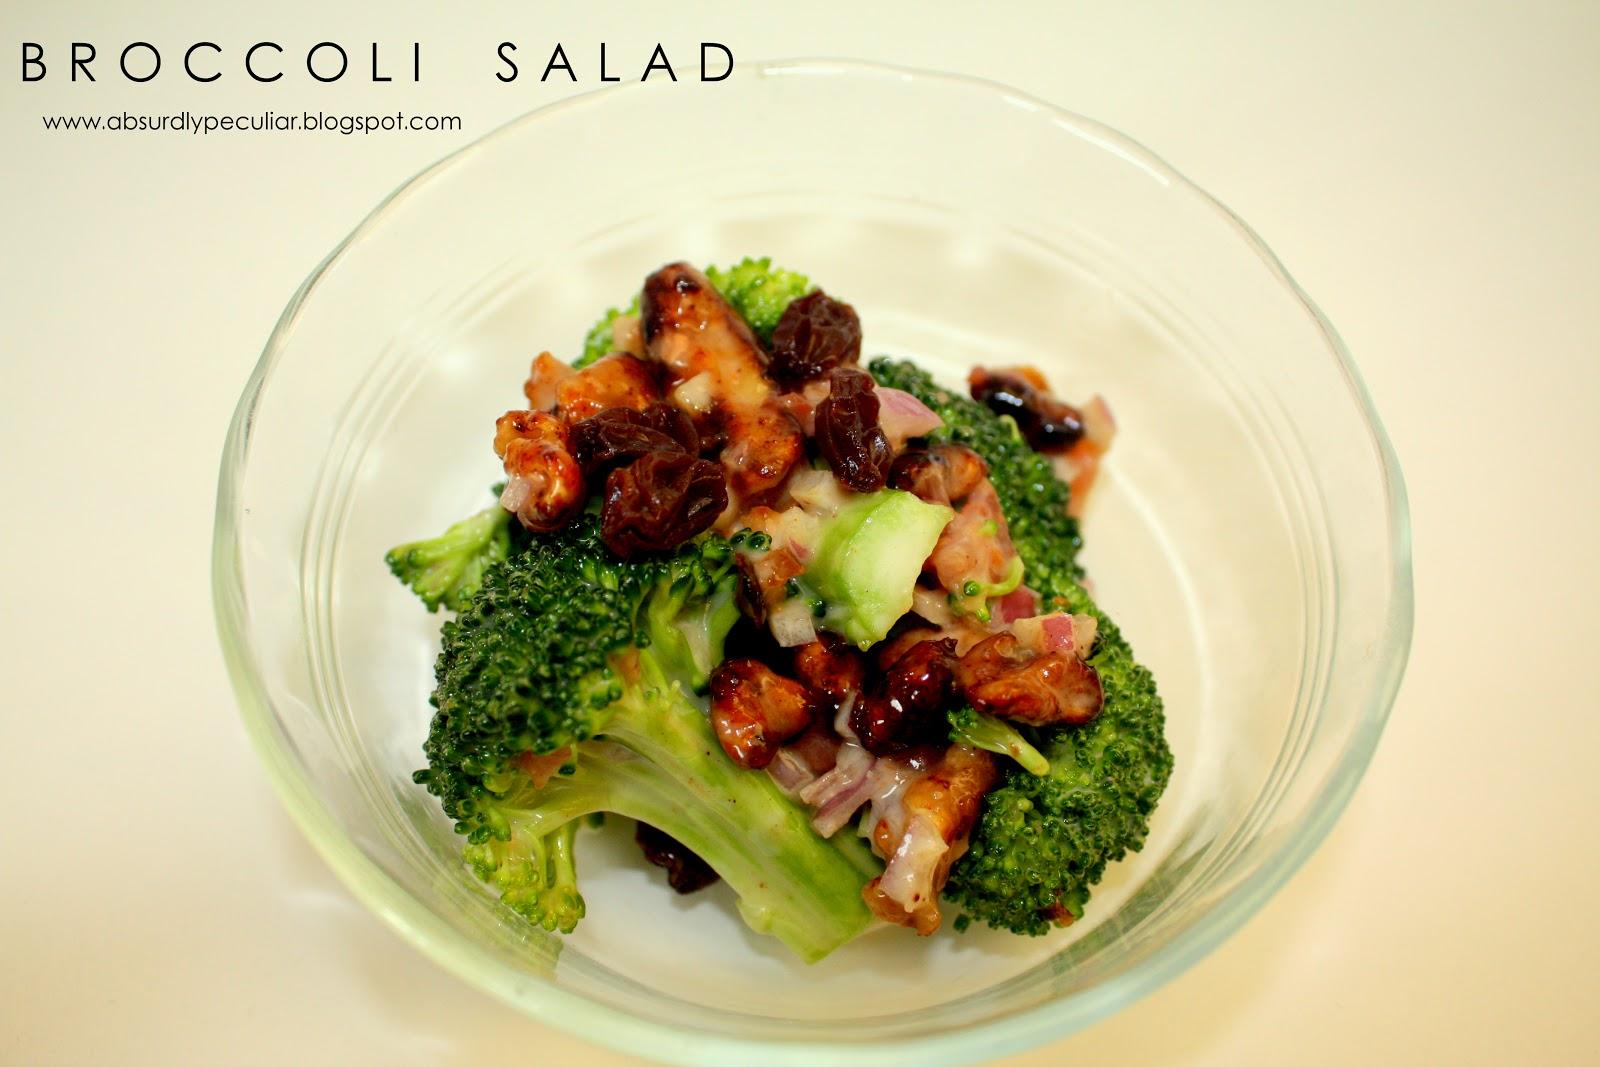 broccoli, broccoli salad, salad, recipe, raisins, onions, bacon, candied walnuts